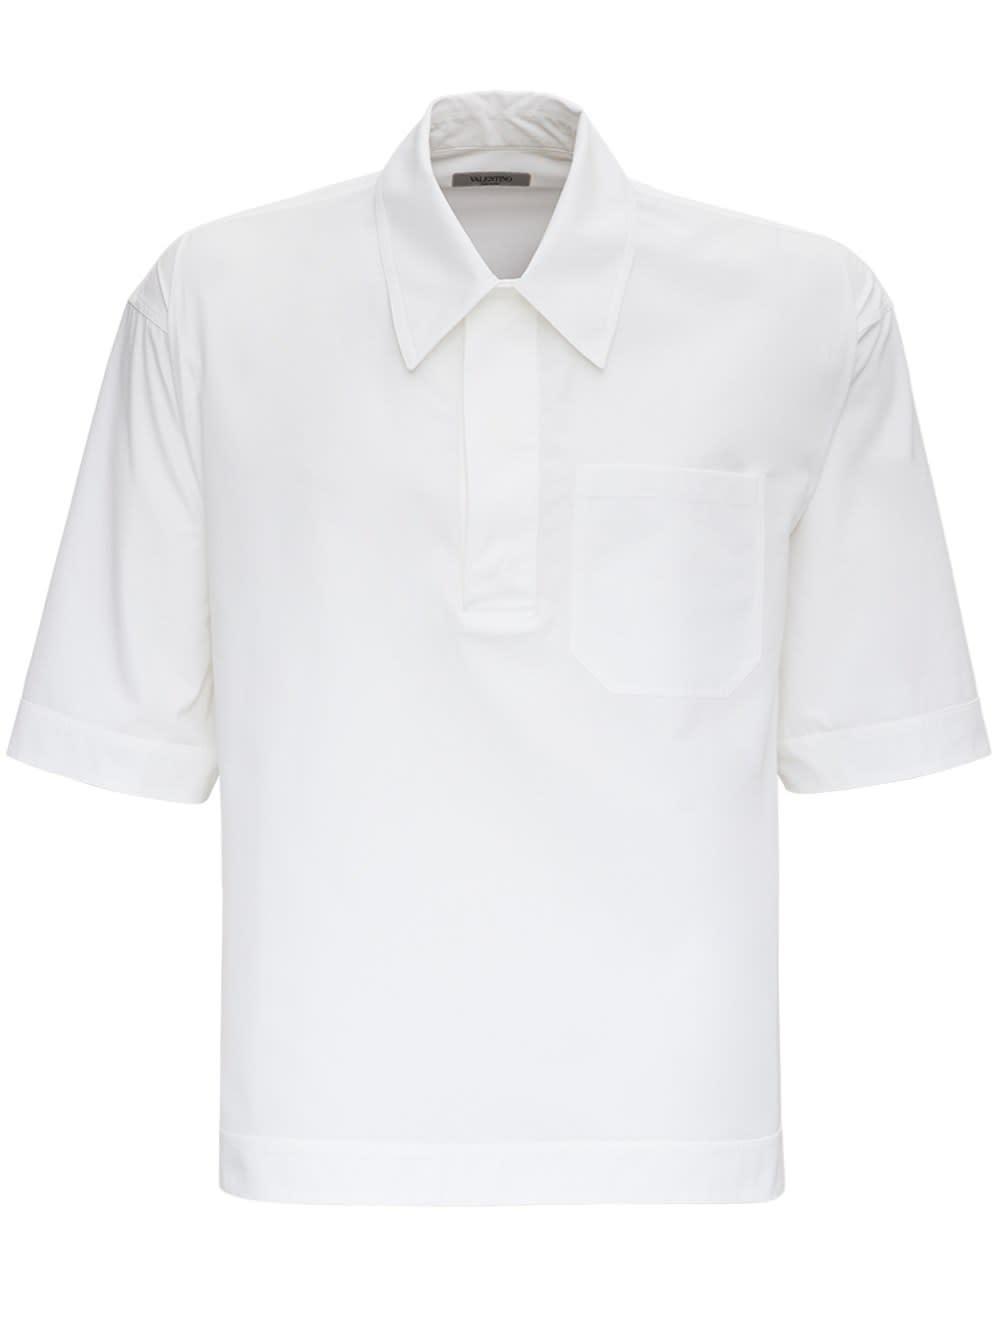 Valentino White Jersey Short Sleeves Shirt